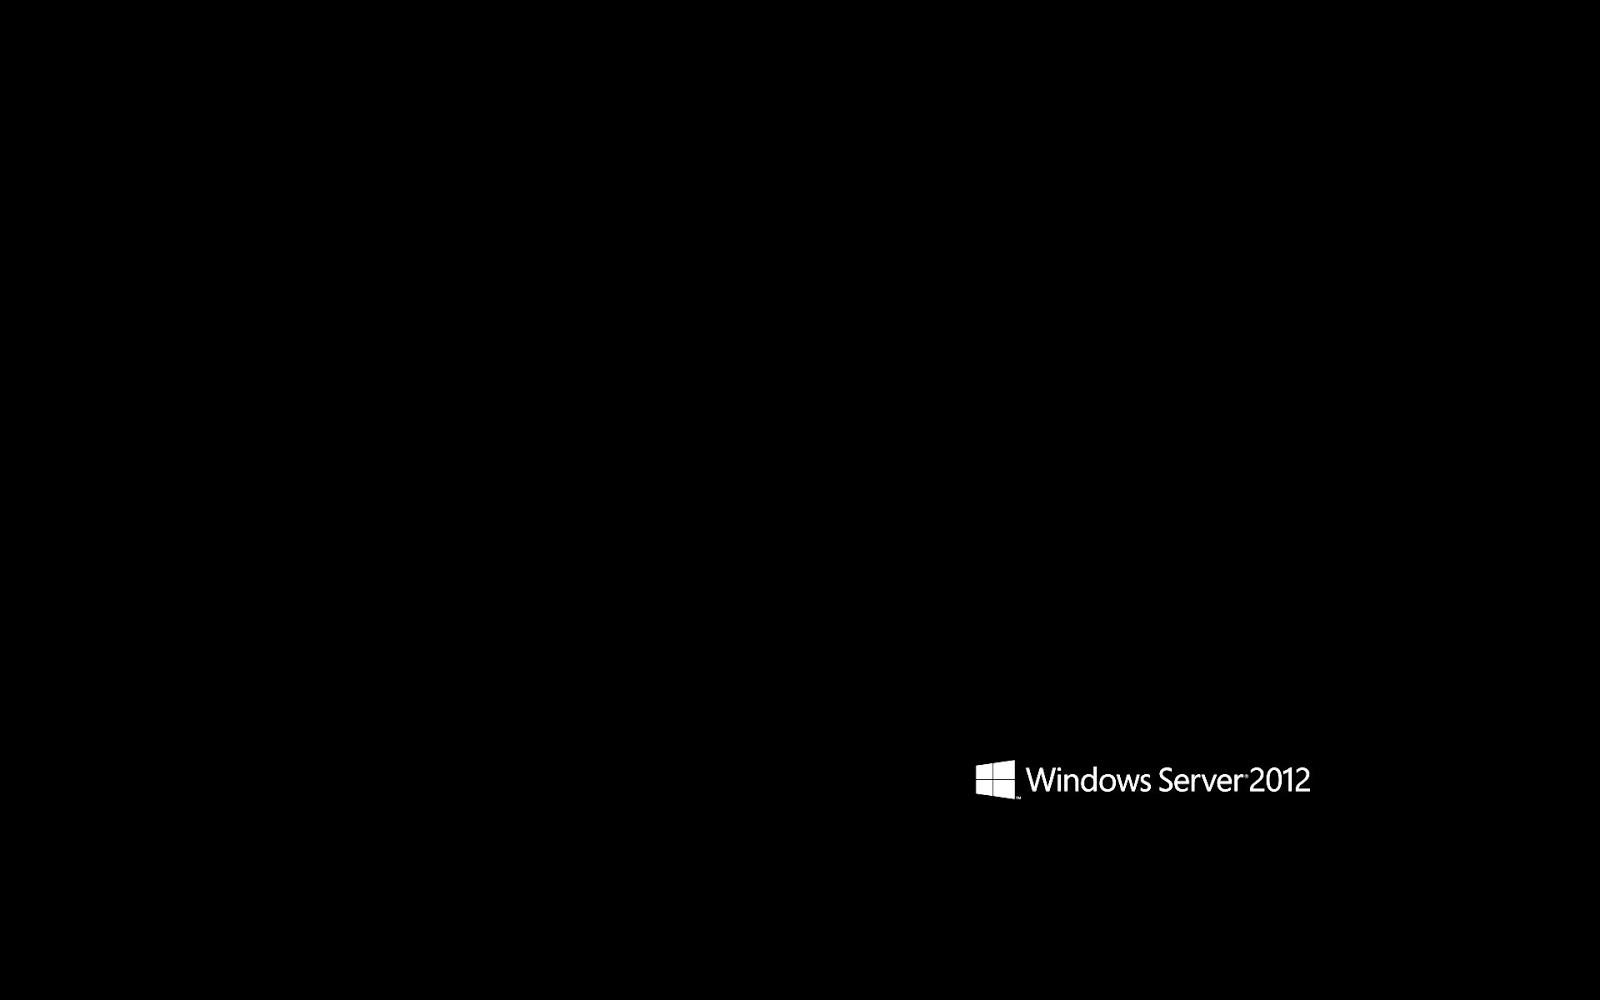 windows server 2012 wallpaper collection | windows server 2012